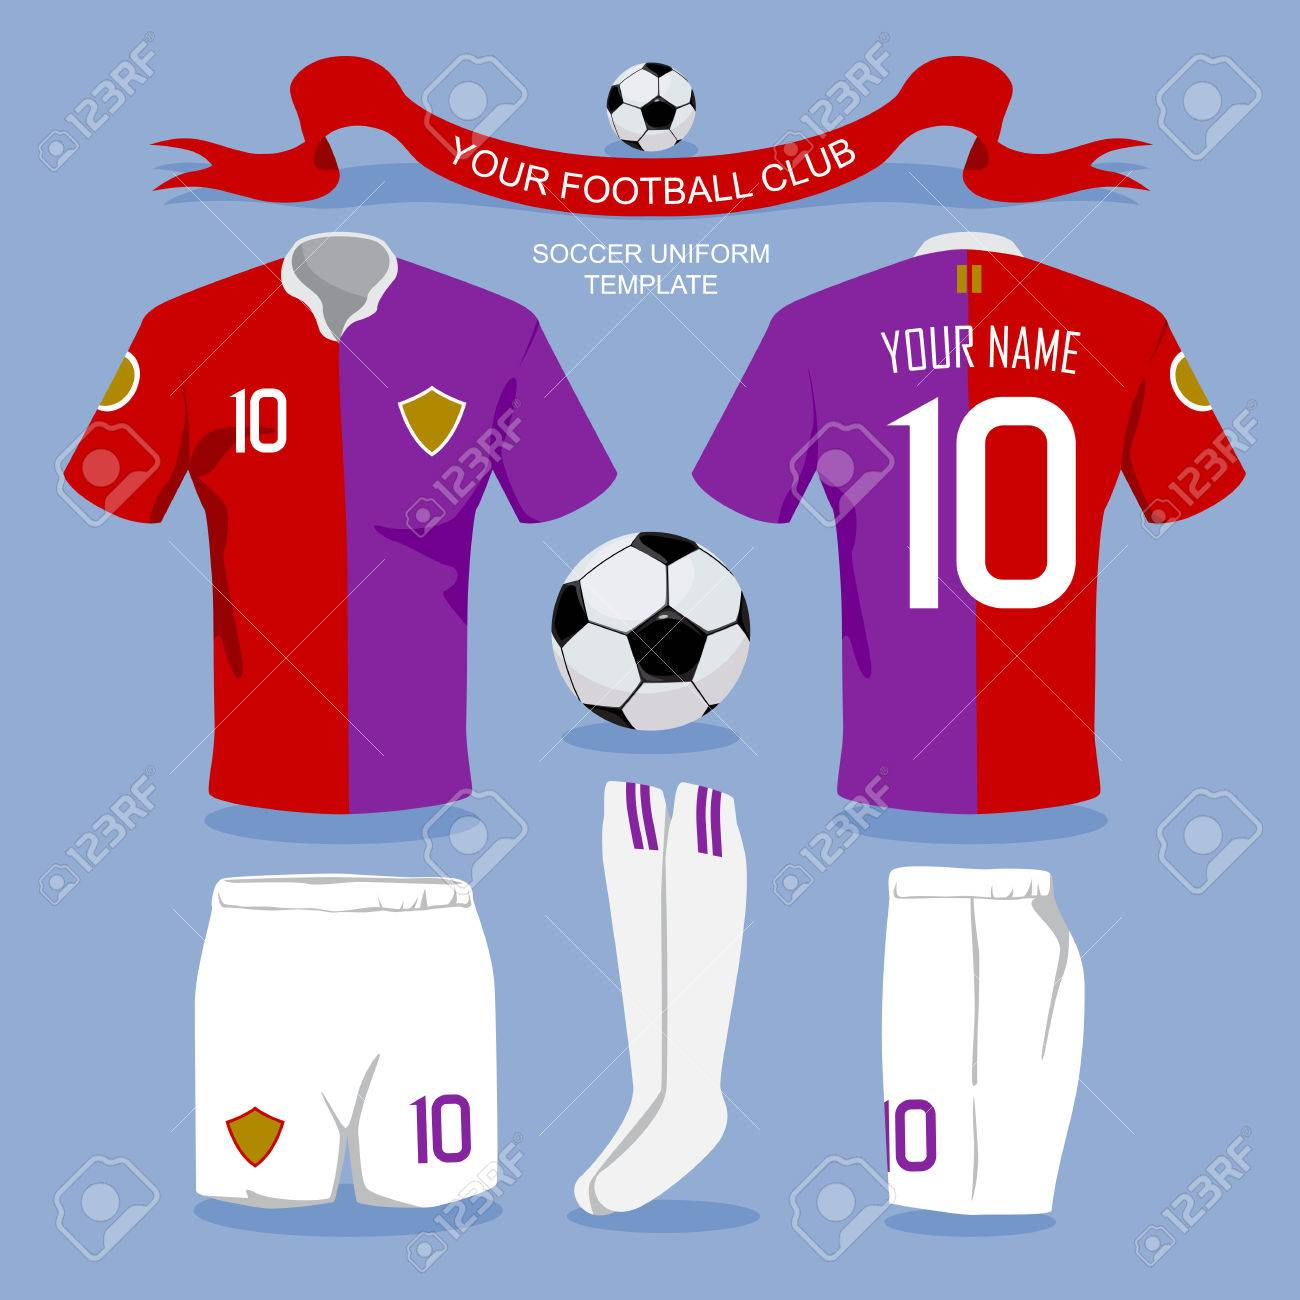 Shirt uniform design vector - Soccer Uniform Template For Your Football Club Illustration Design Stock Vector 41580358